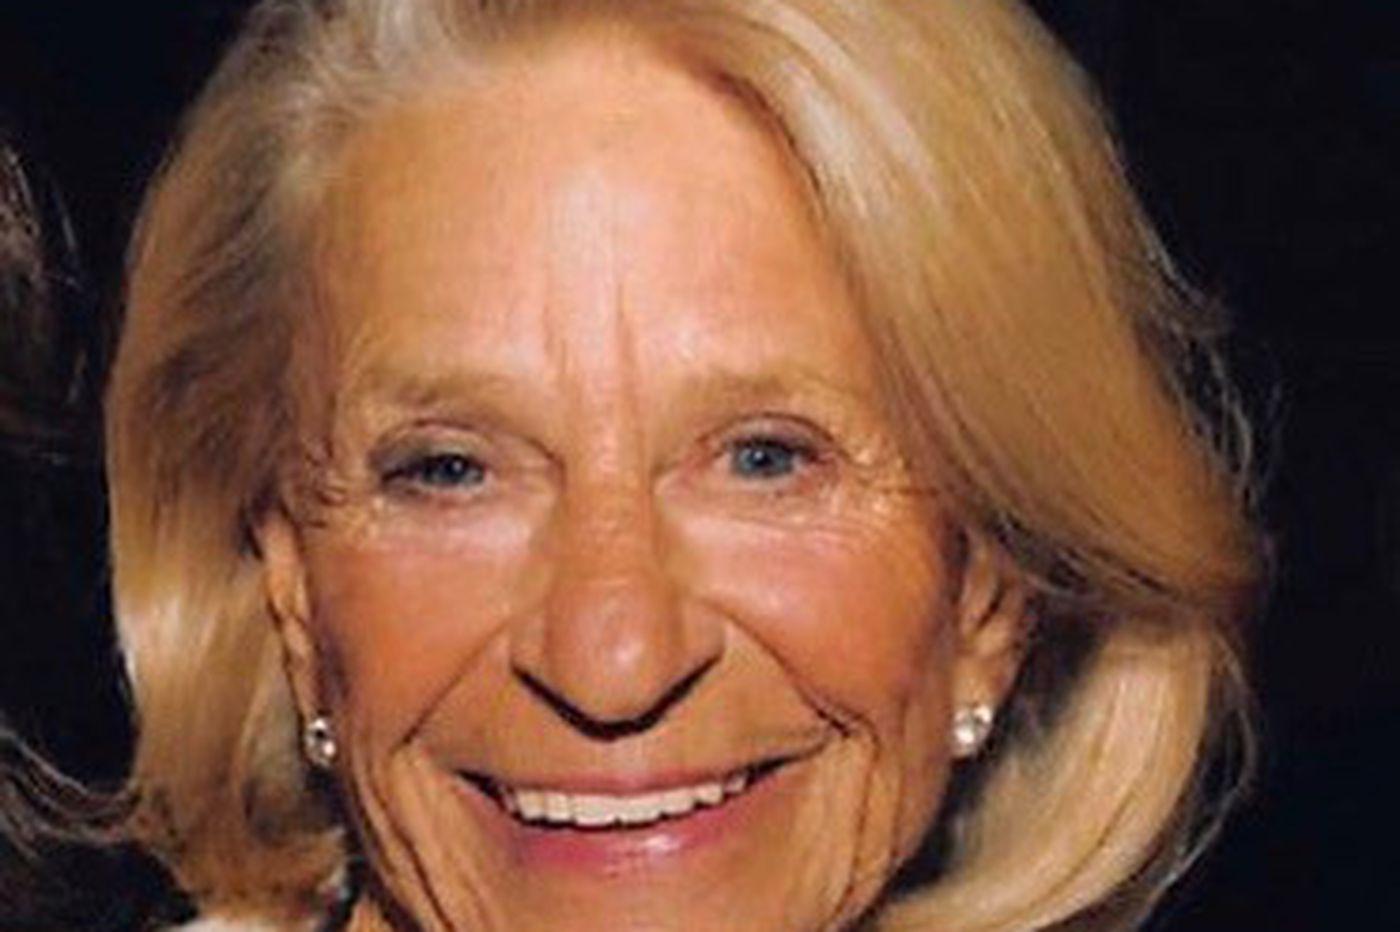 Frances M. Maguire, artist, mother, and philanthropist, dies at 84